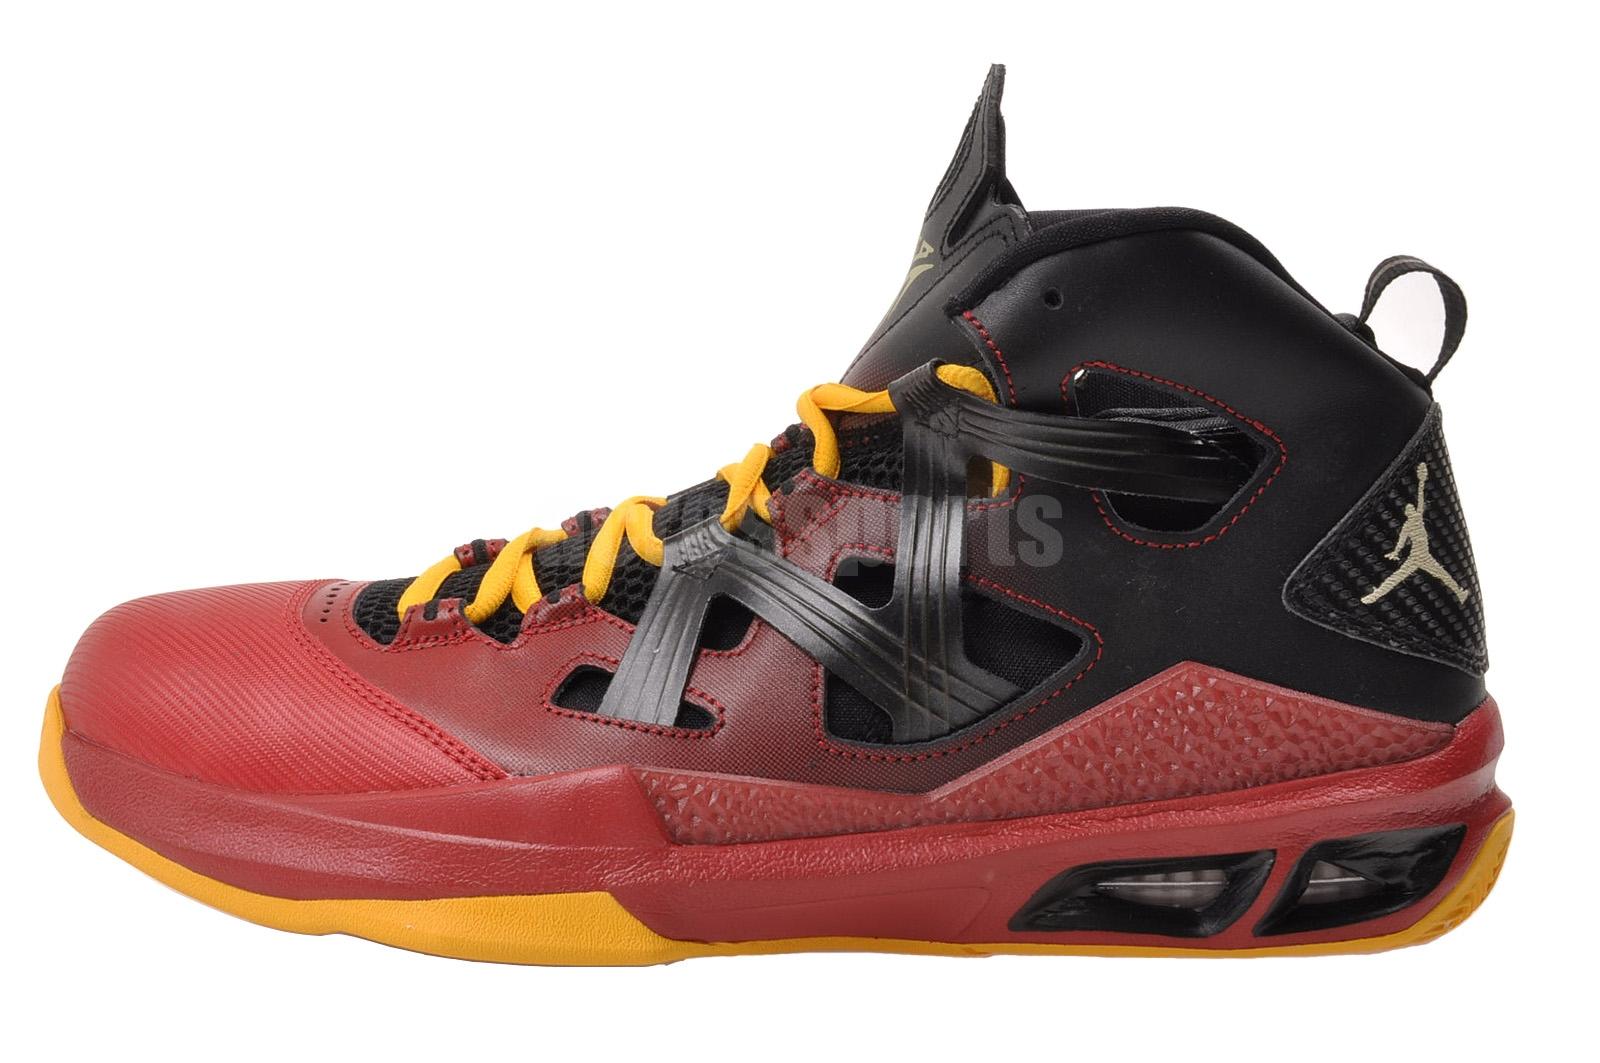 Nike Jordan Melo M9 Mens Basketball Shoes Carmelo Anthony ...